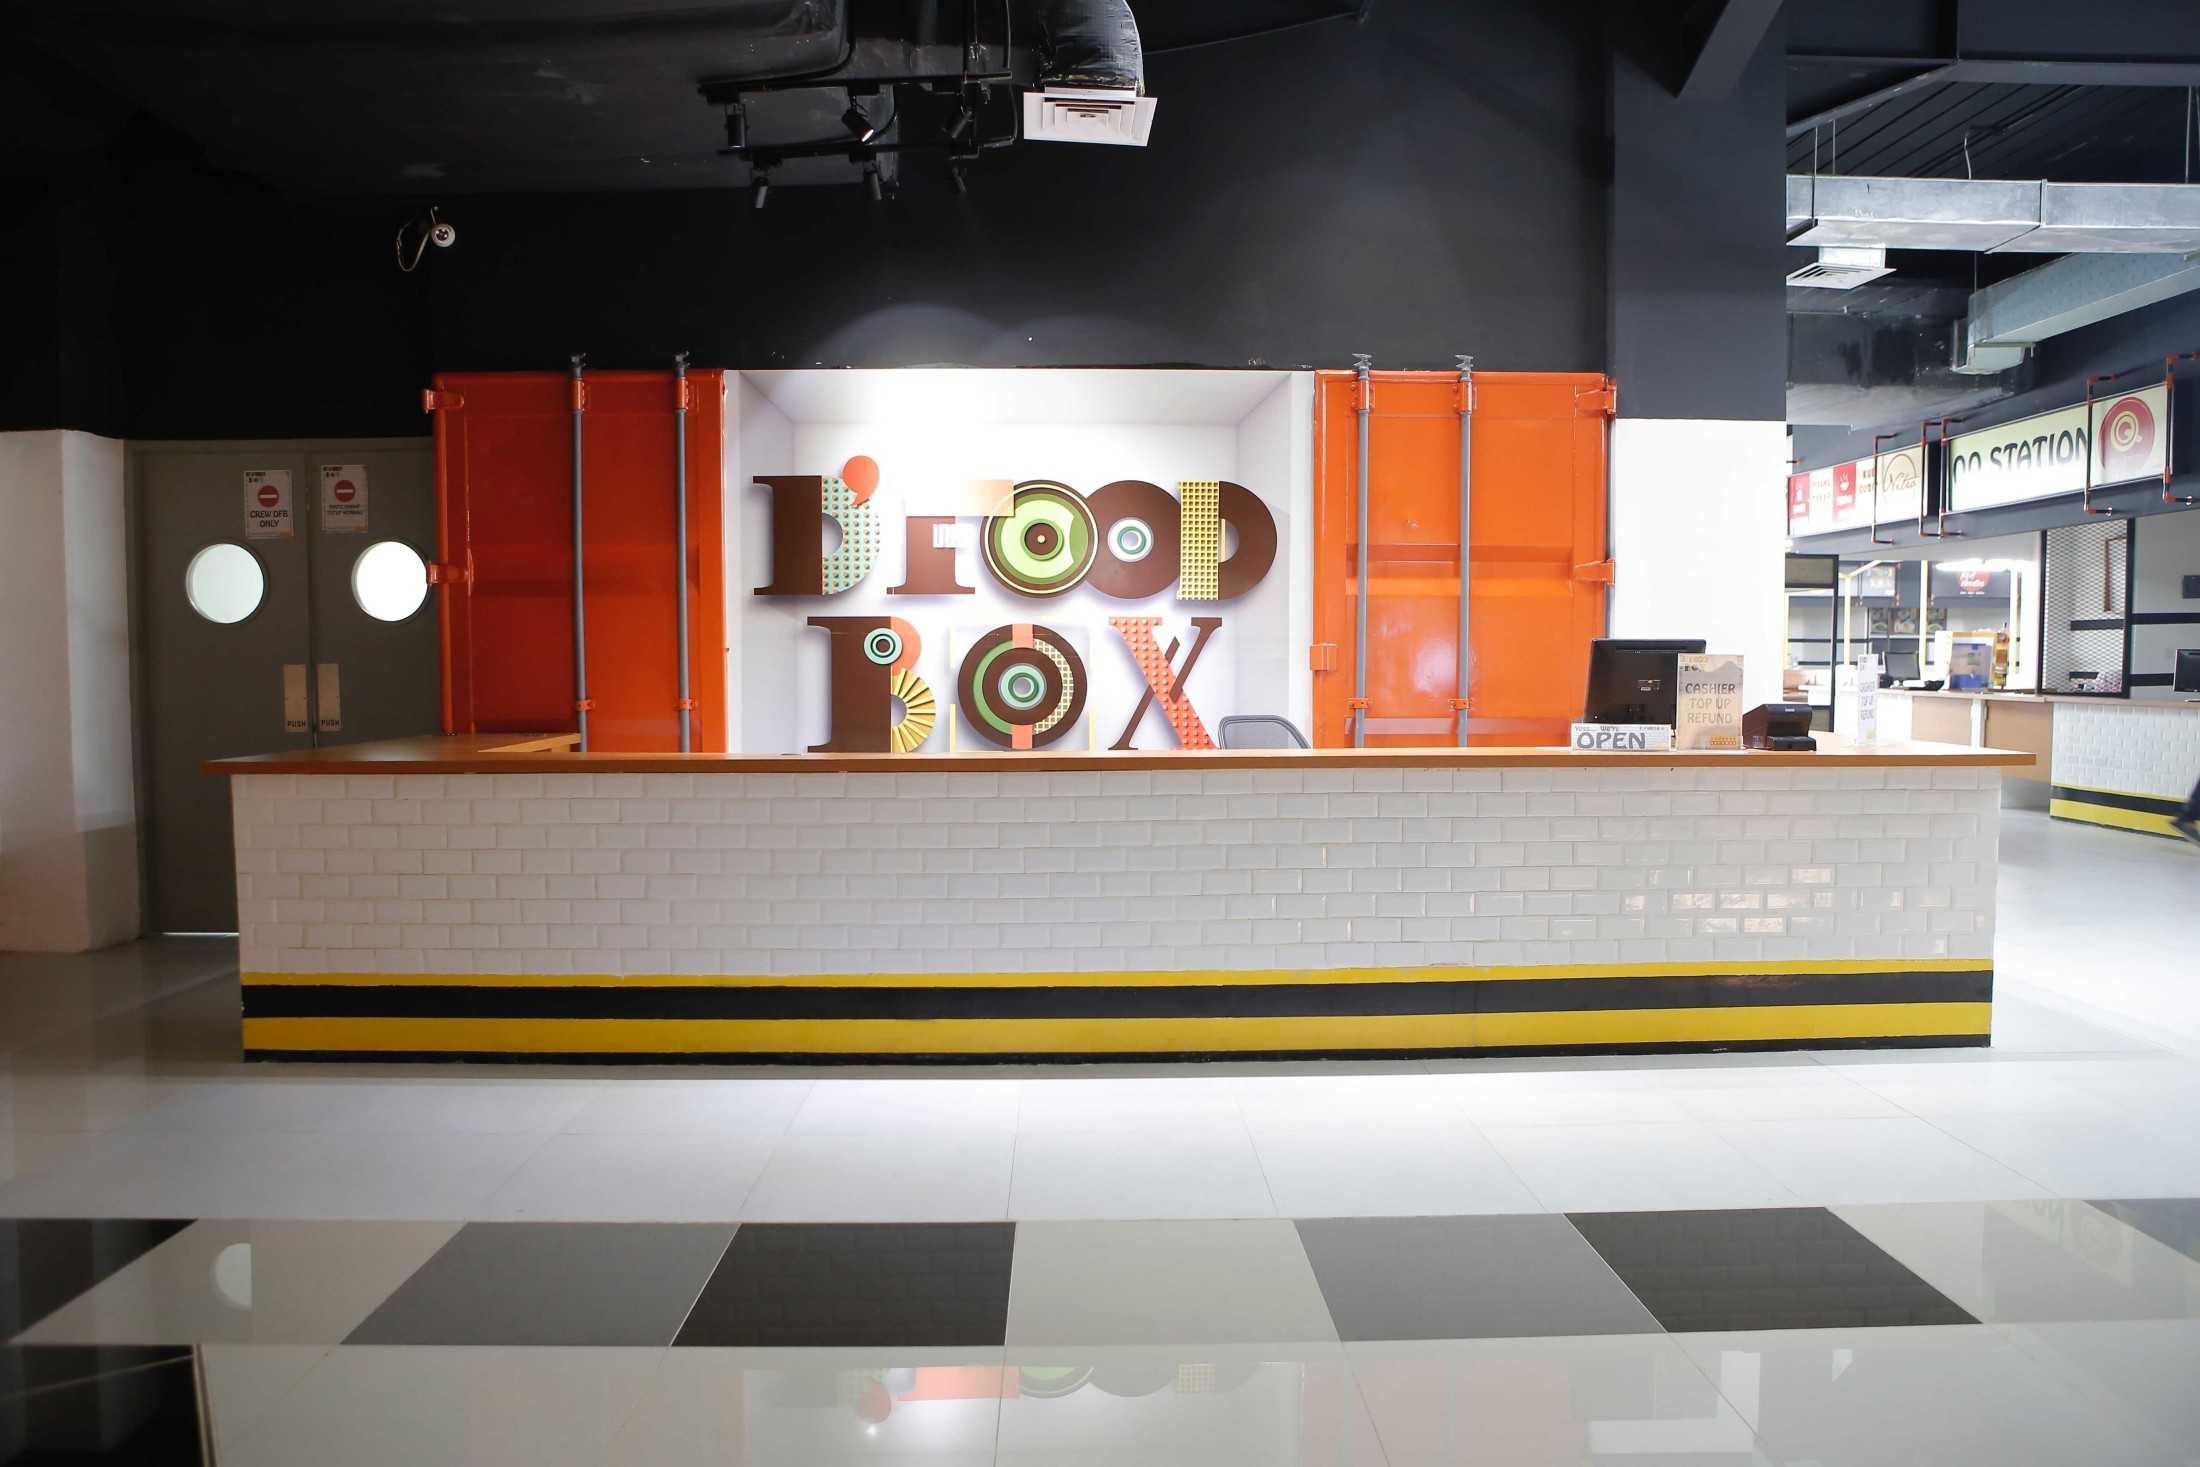 Home By Fabelio.com D'mall Food Court Jl. Margonda Raya, Kemiri Muka, Beji, Kota Depok, Jawa Barat, Indonesia Jl. Margonda Raya, Kemiri Muka, Beji, Kota Depok, Jawa Barat, Indonesia Home-By-Fabeliocom-Dmall-Food-Court  64944